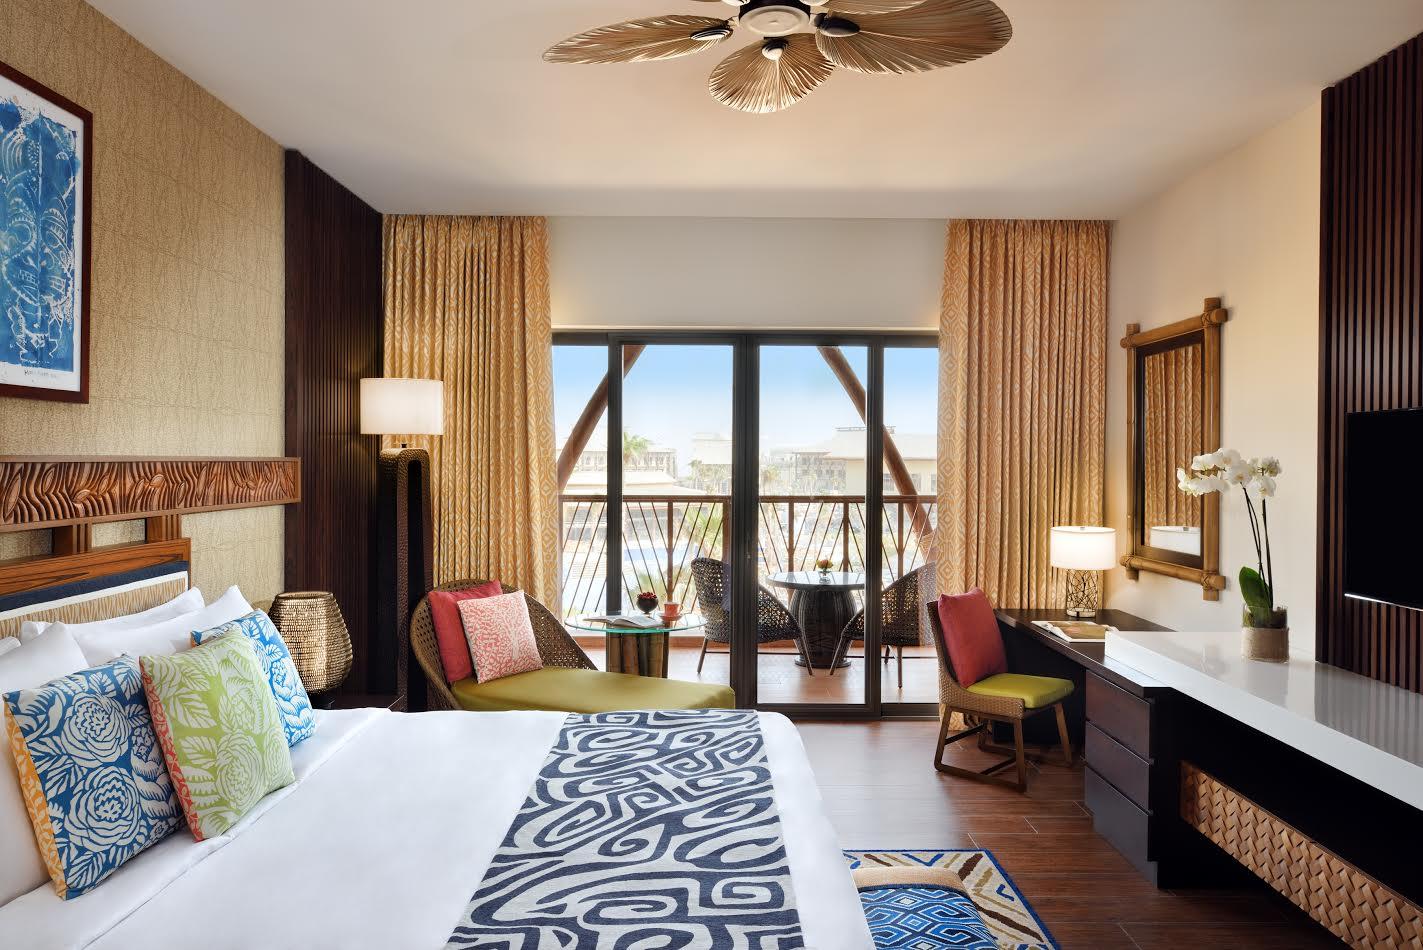 Photo of فندق لابيتا أوتوجراف كوليكشن يفتح أبوابه للضيوف في دبي